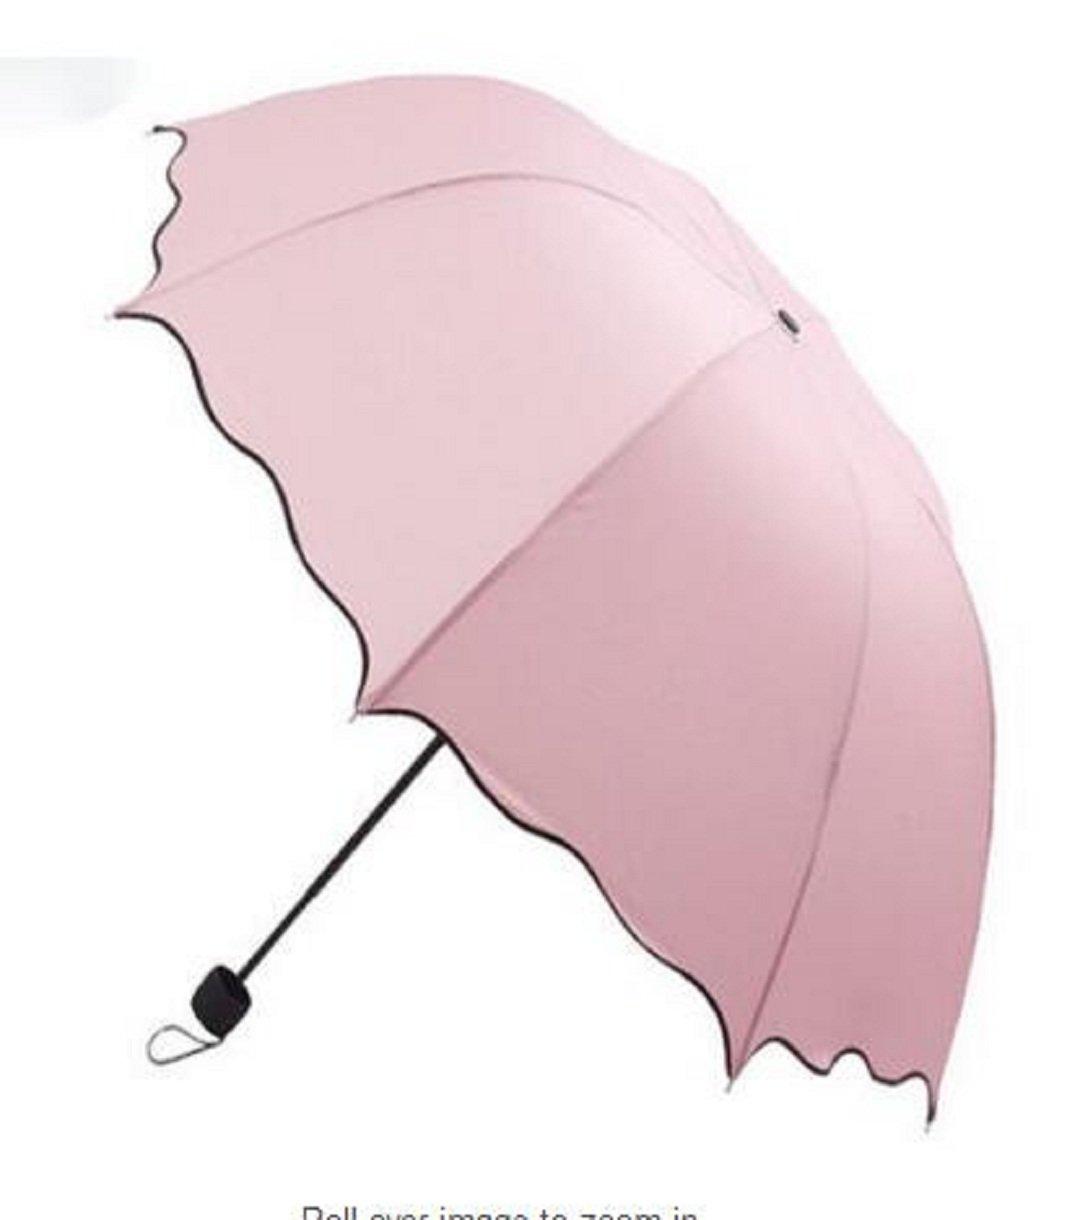 Wendin Parasol Triple Folding Dome Ruffled Sun Rain Umbrella Anti-UV Parasol Pink Wendin creative Co .ltd.